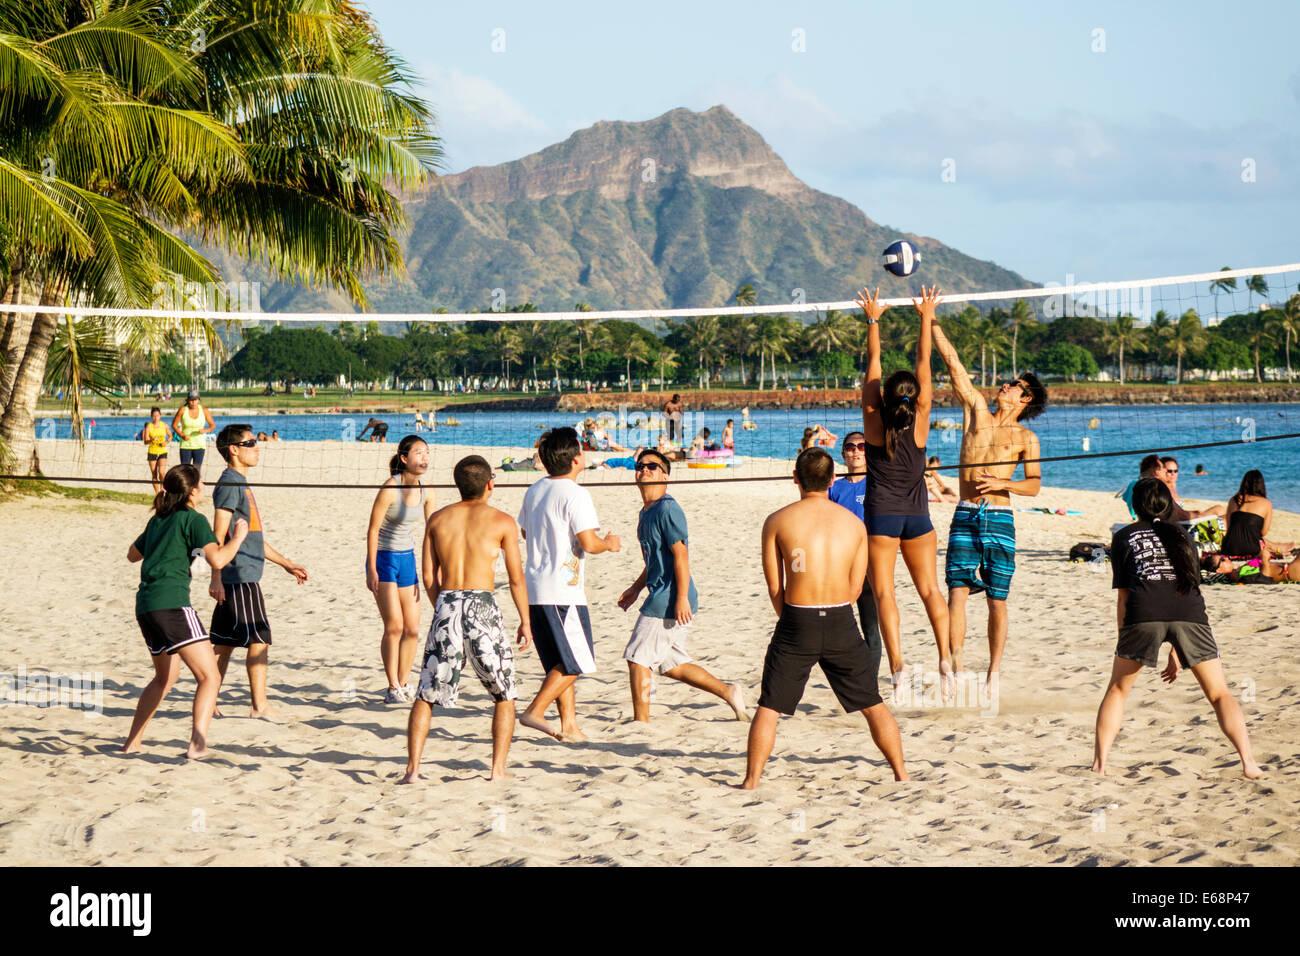 Hawaii Hawaiian Honolulu Ala Moana Beach State Regional Park volleyball game recreation sand Asian student playing Stock Photo